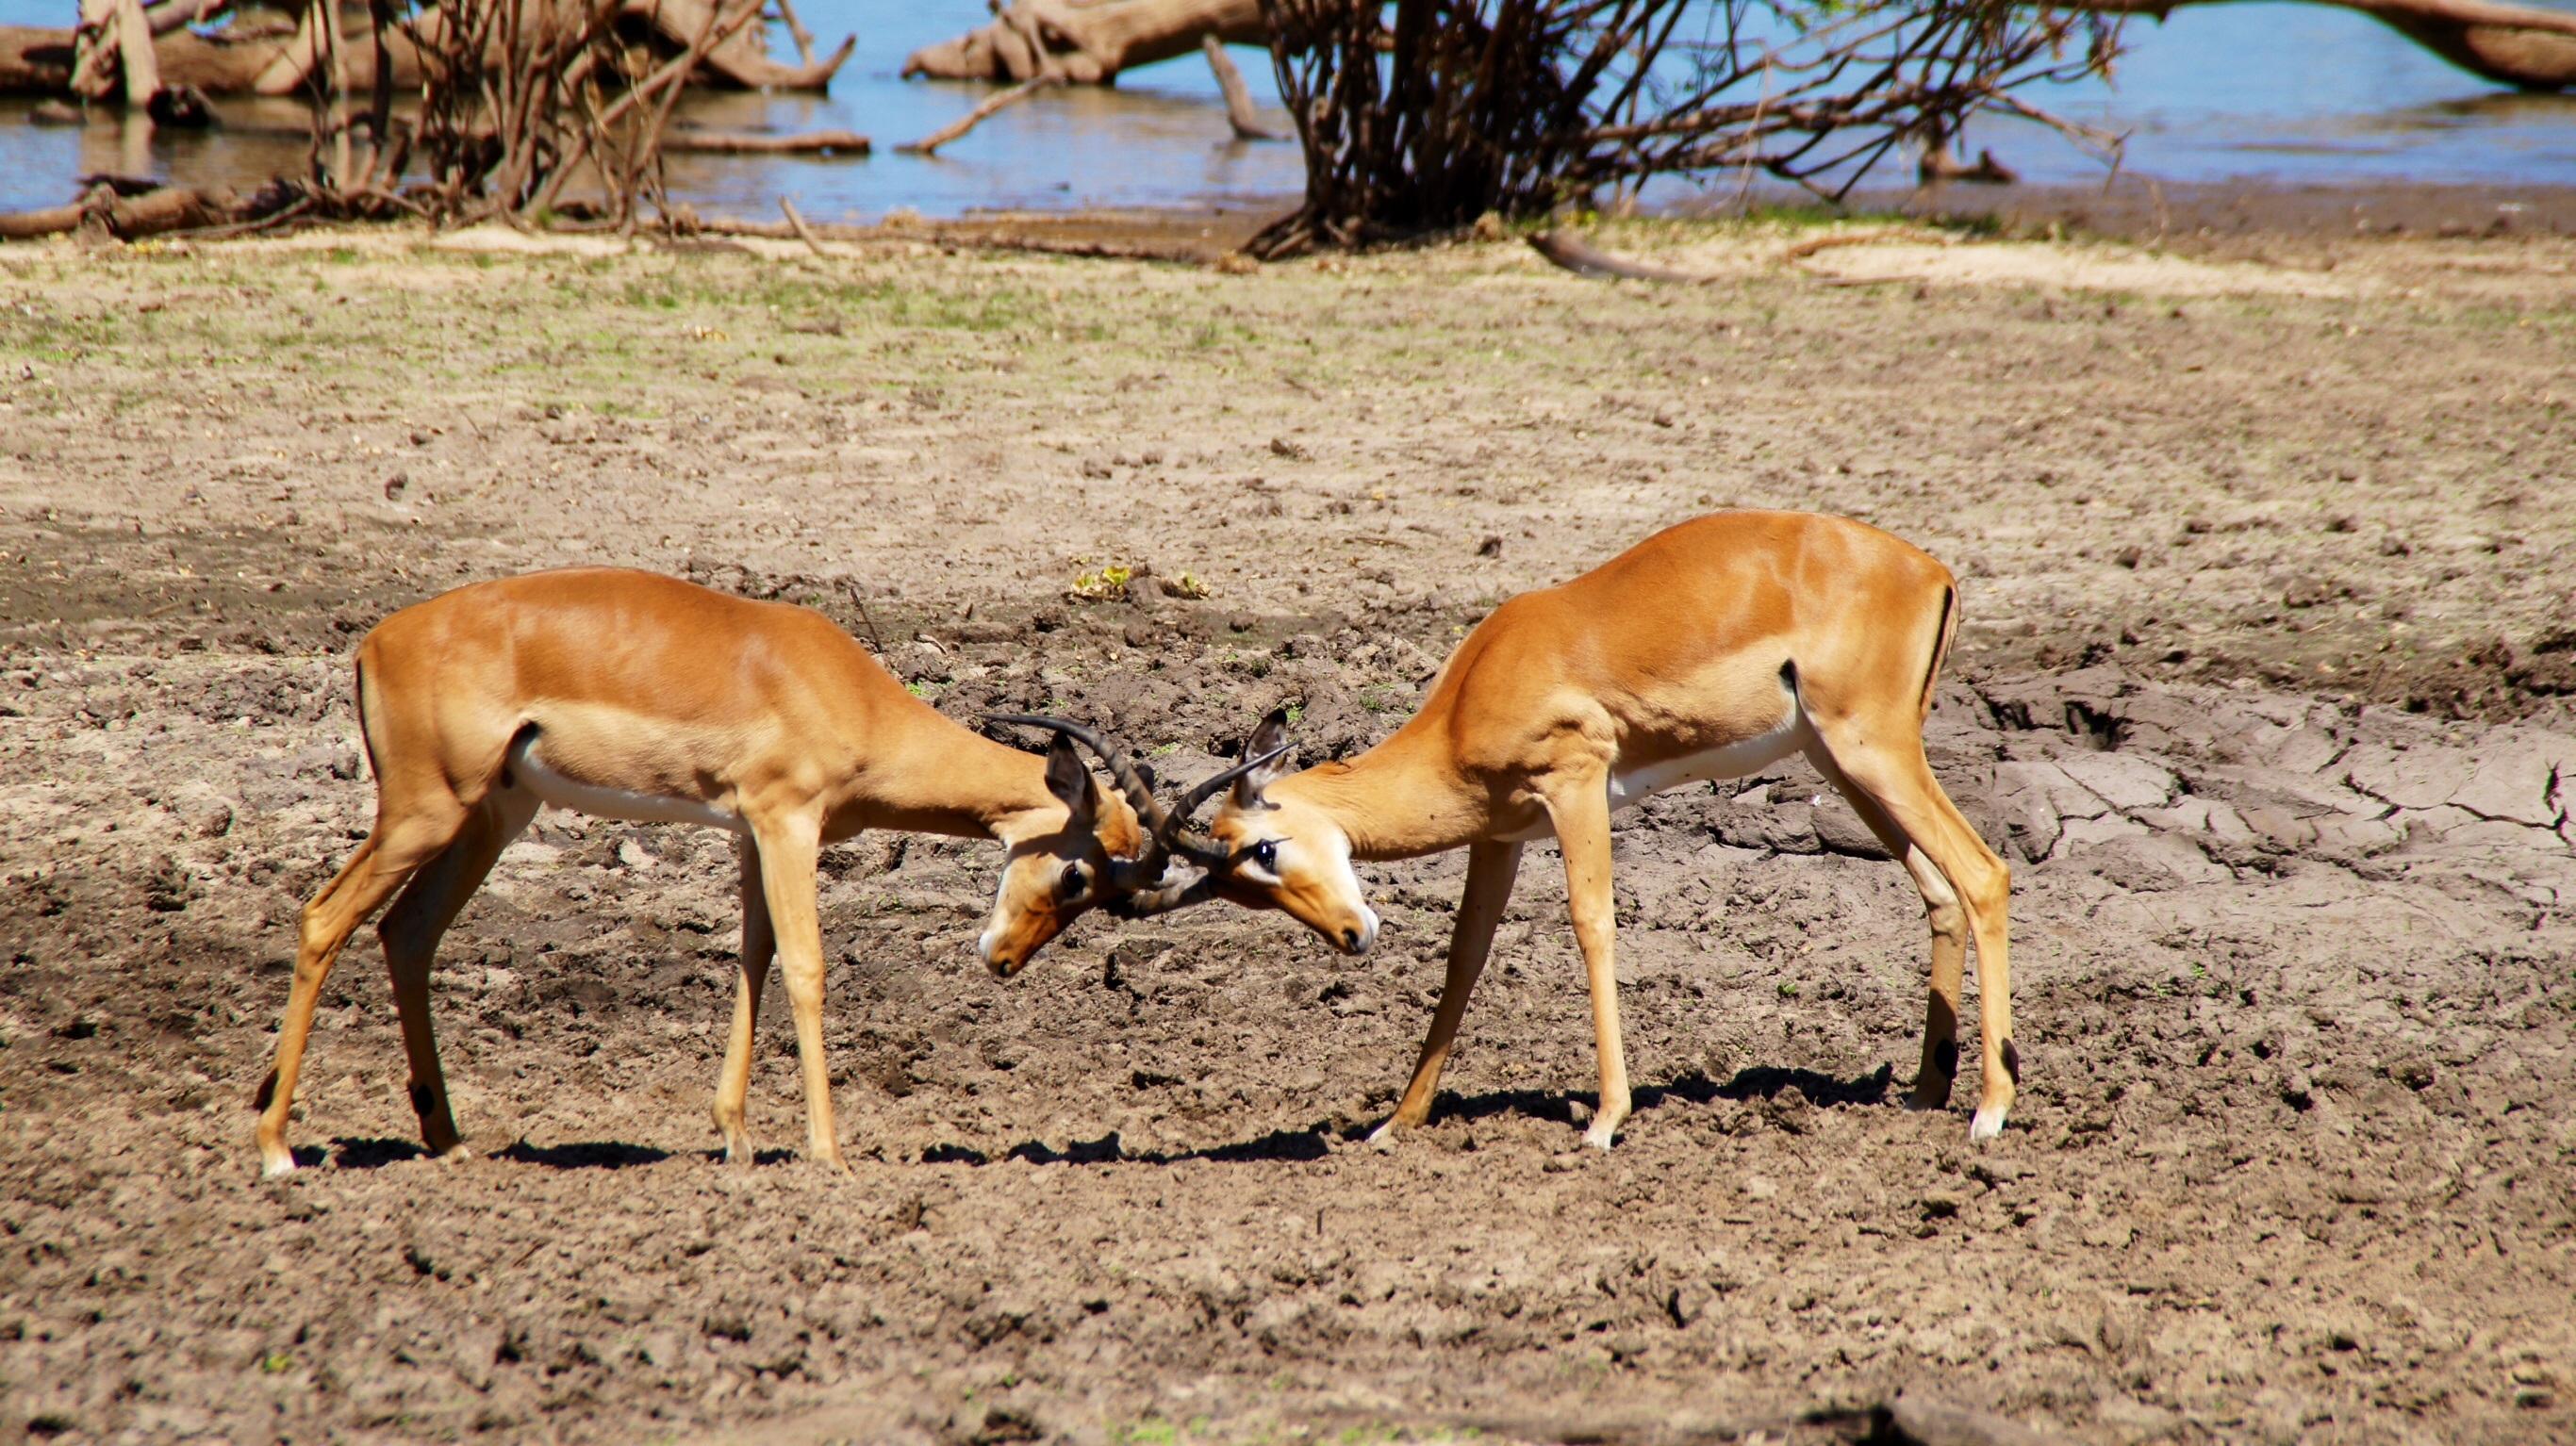 Kamp på savannen